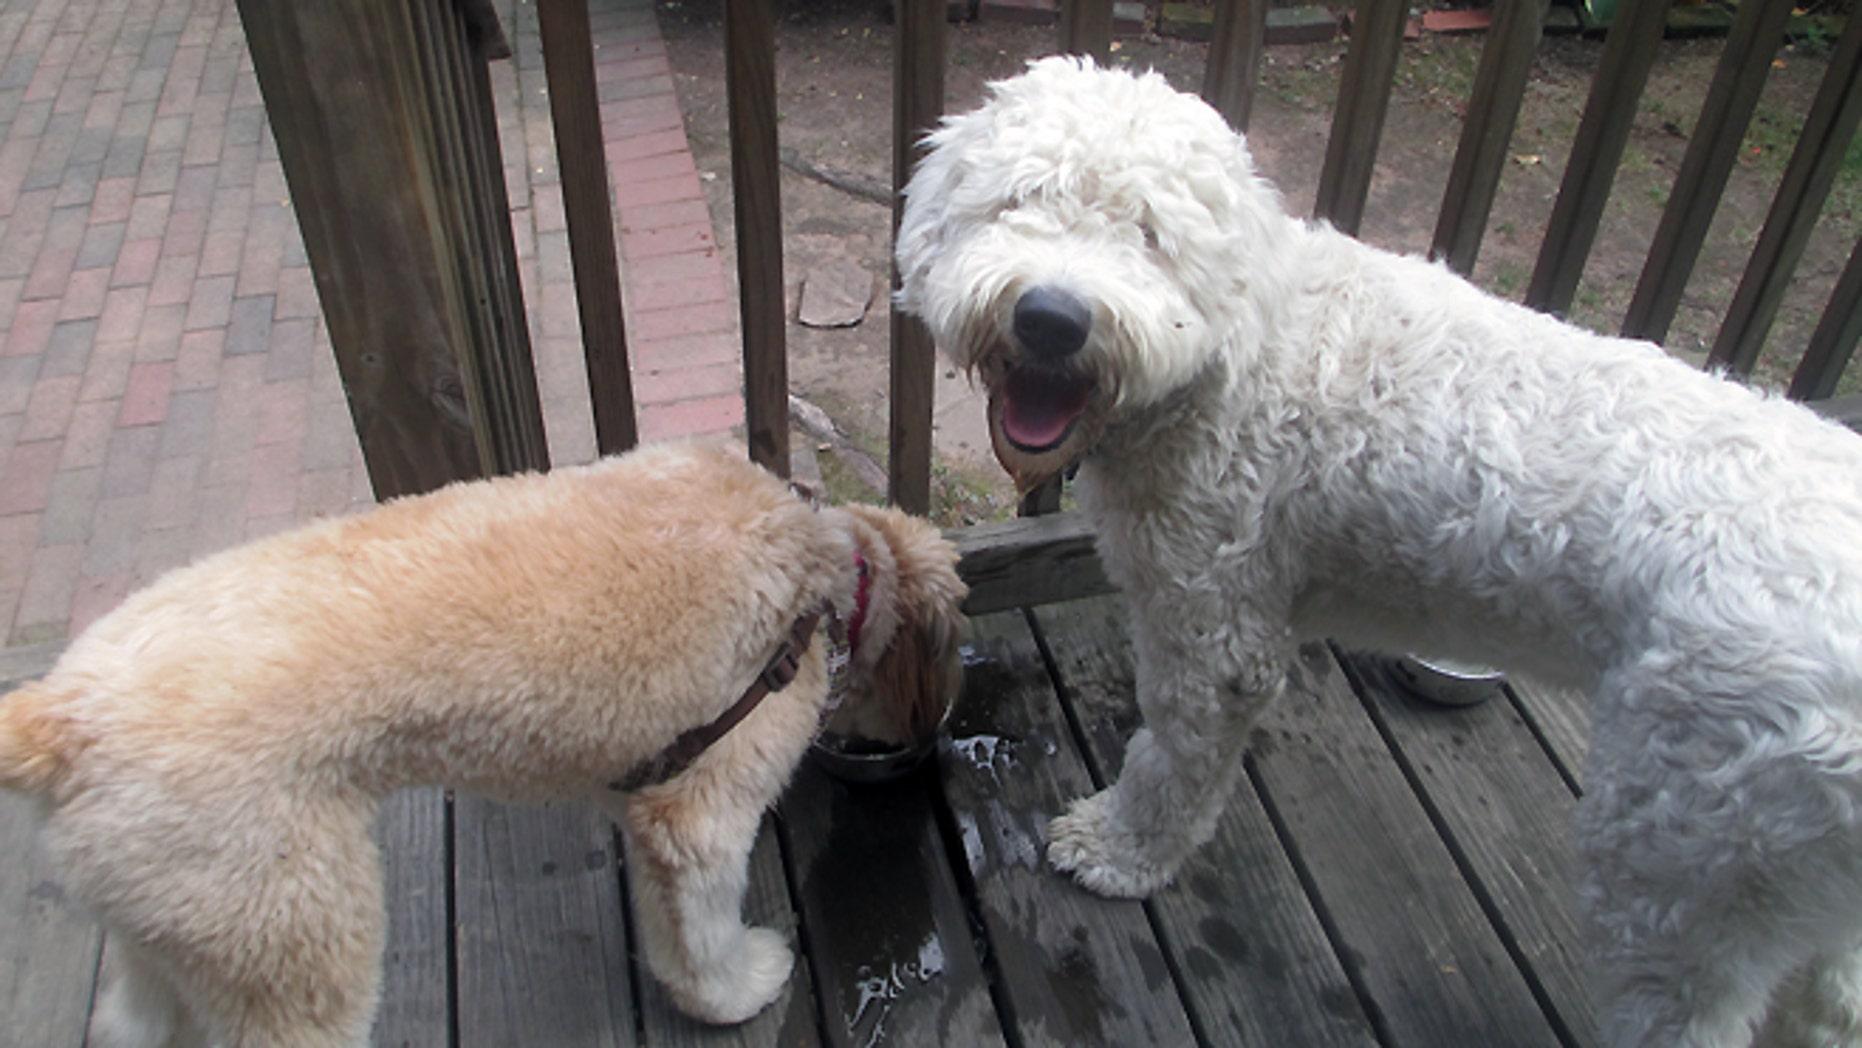 Elsie and Brady